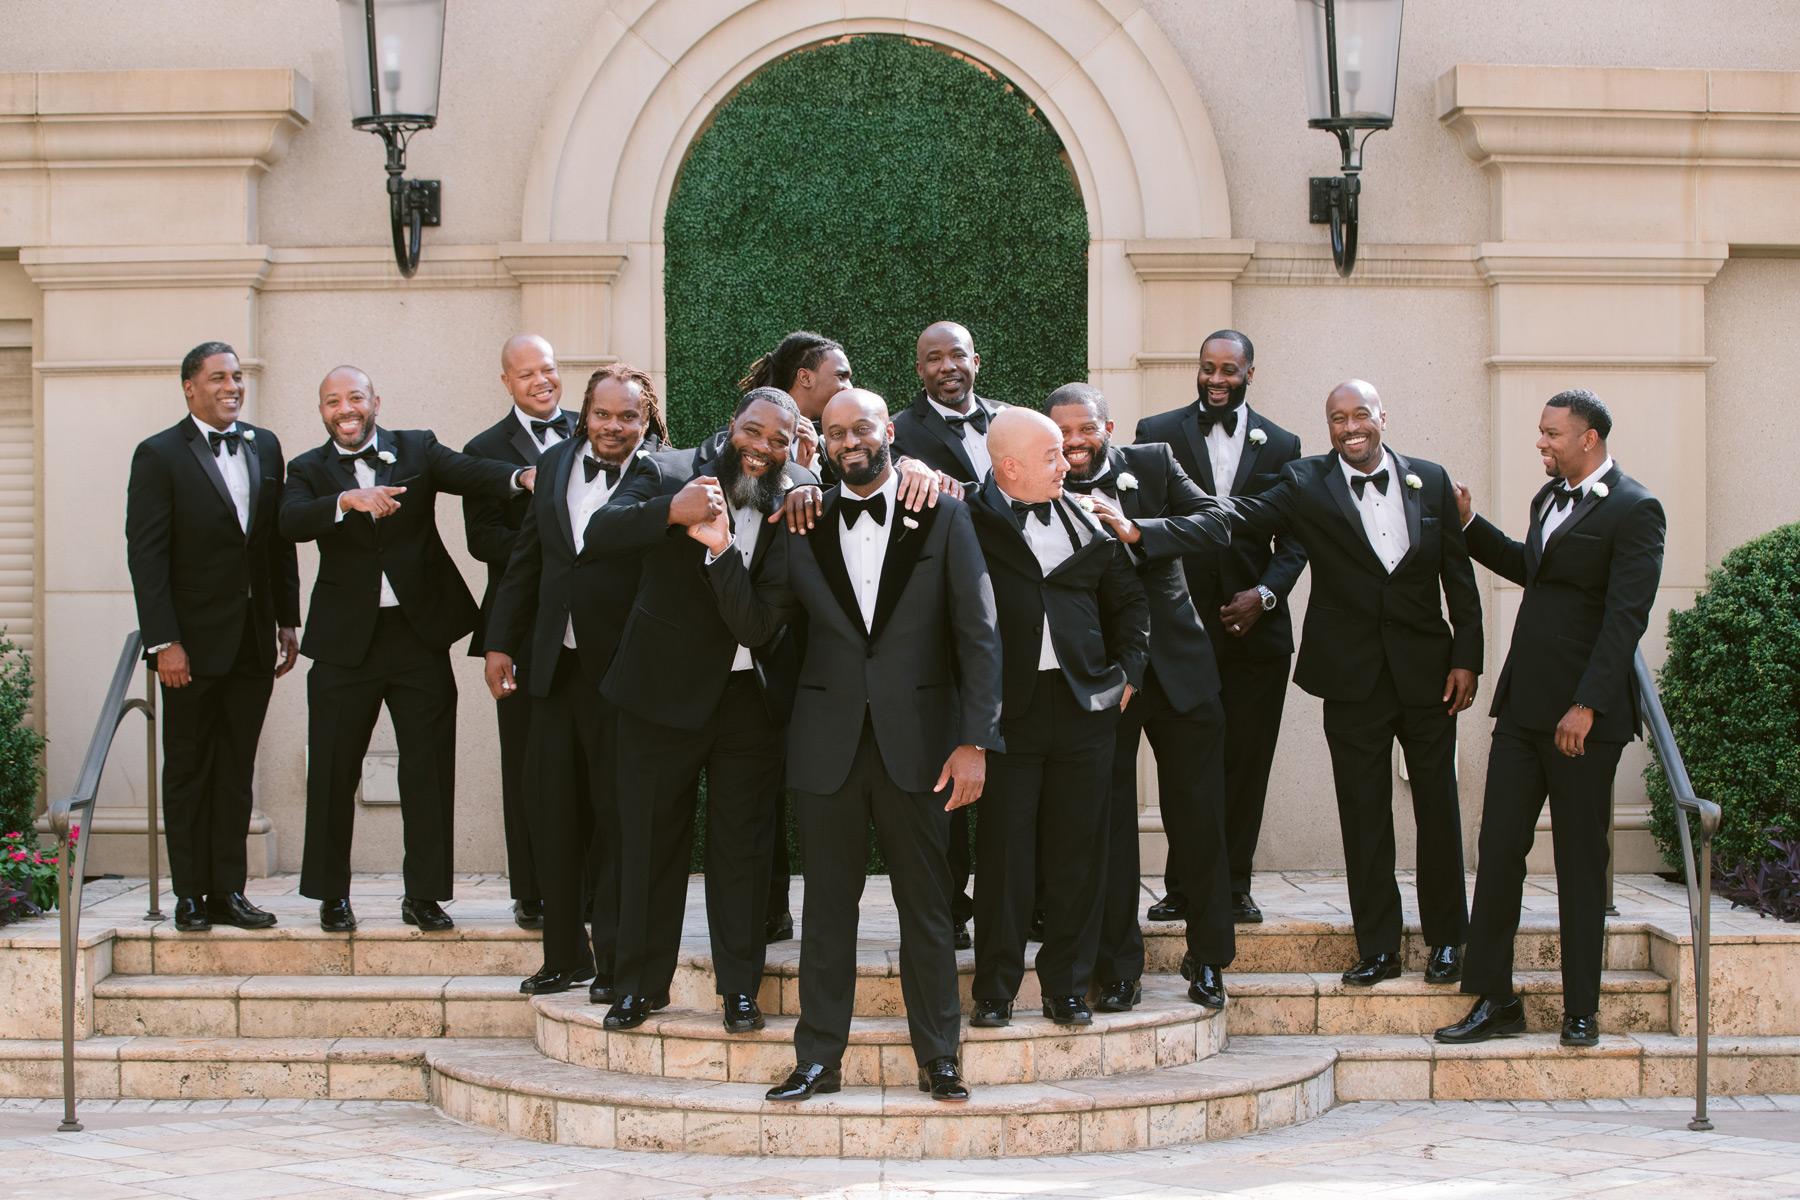 St-Regis-Wedding-Atlanta-0914-0020